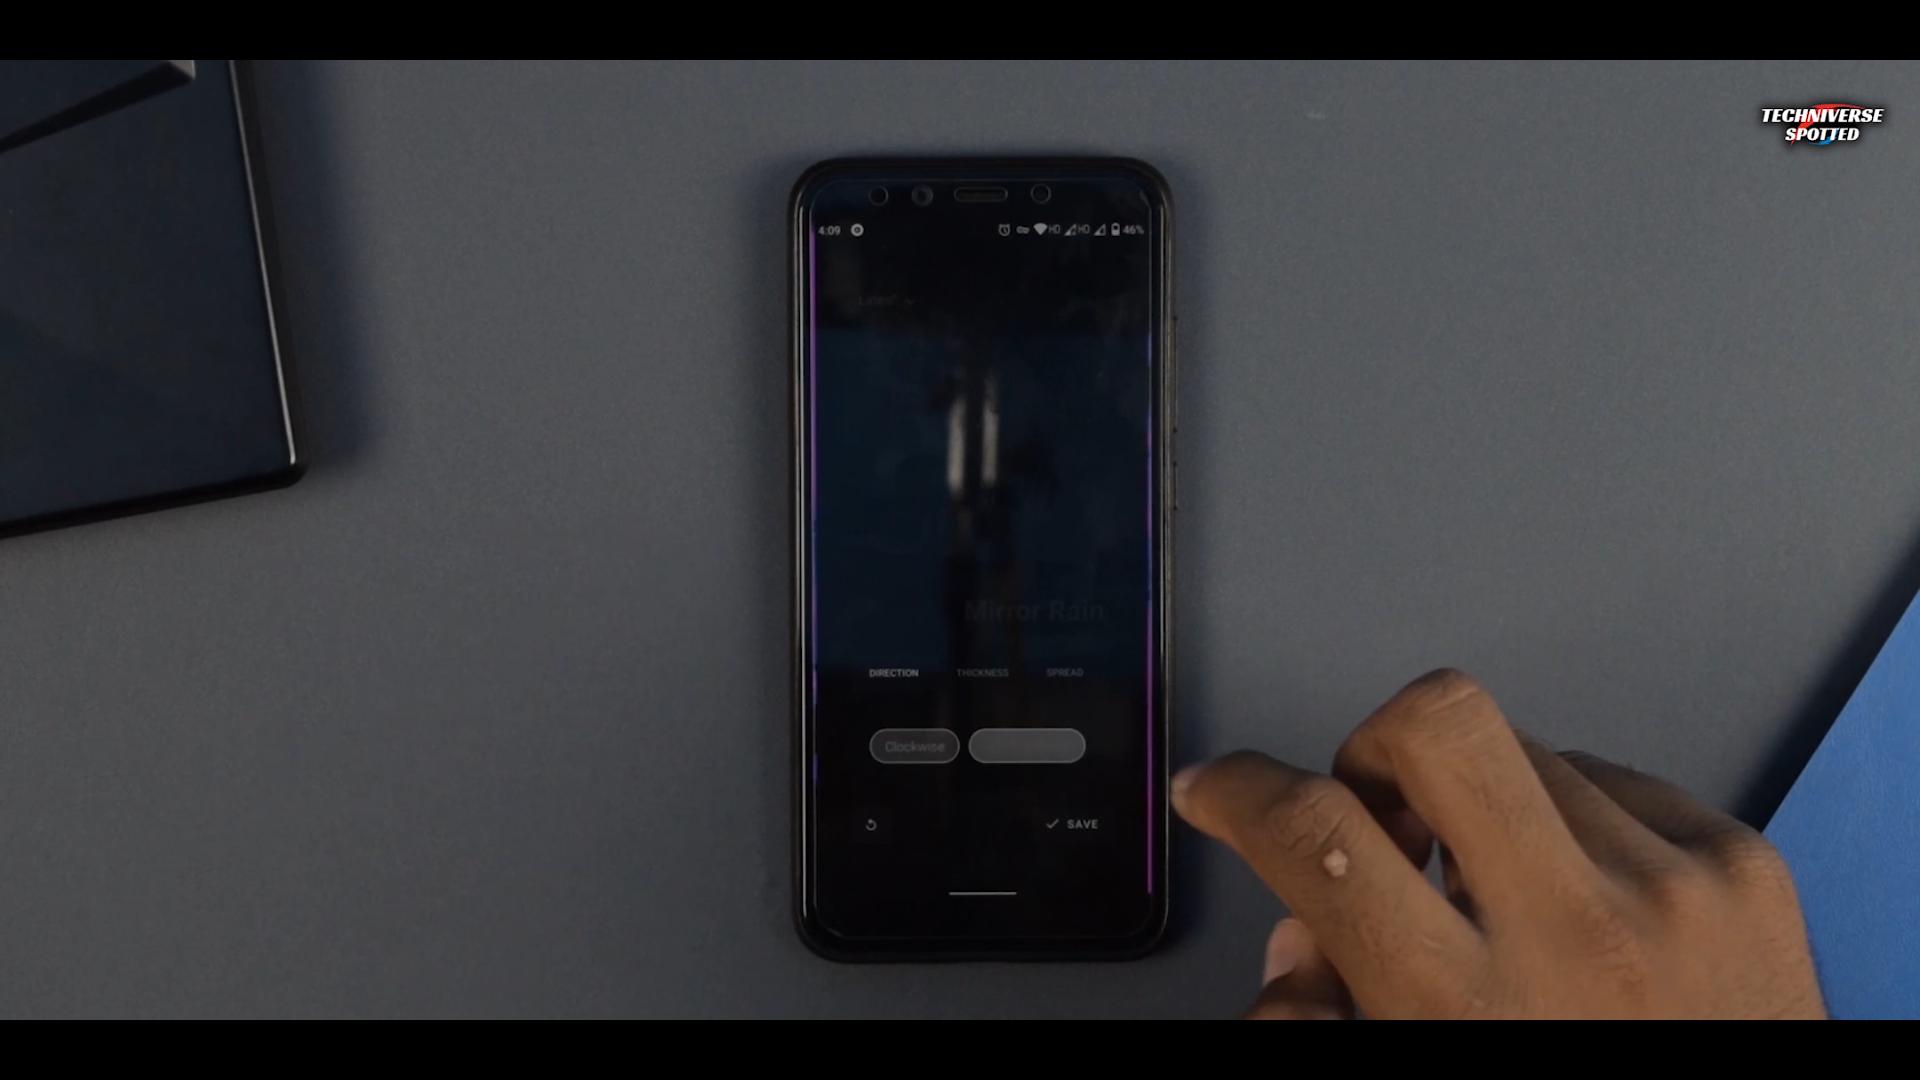 Enhance Your Music Listening Experience With Muviz Edge.